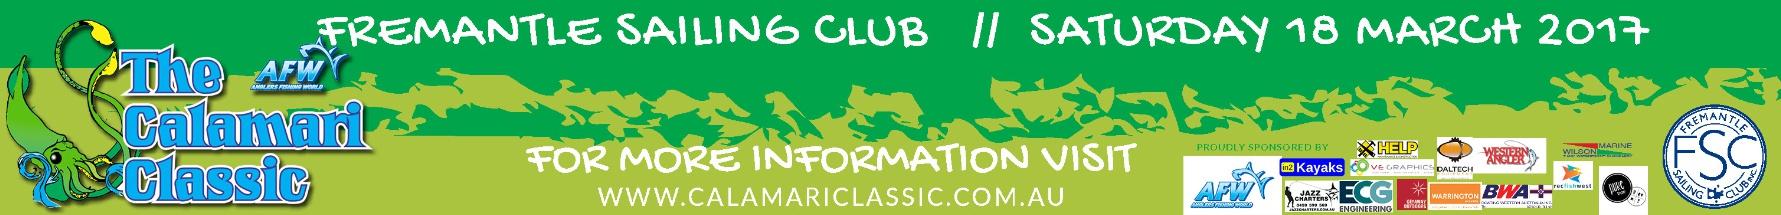 Fremantle Sailing Club Calamari Classic 2017 banner ad